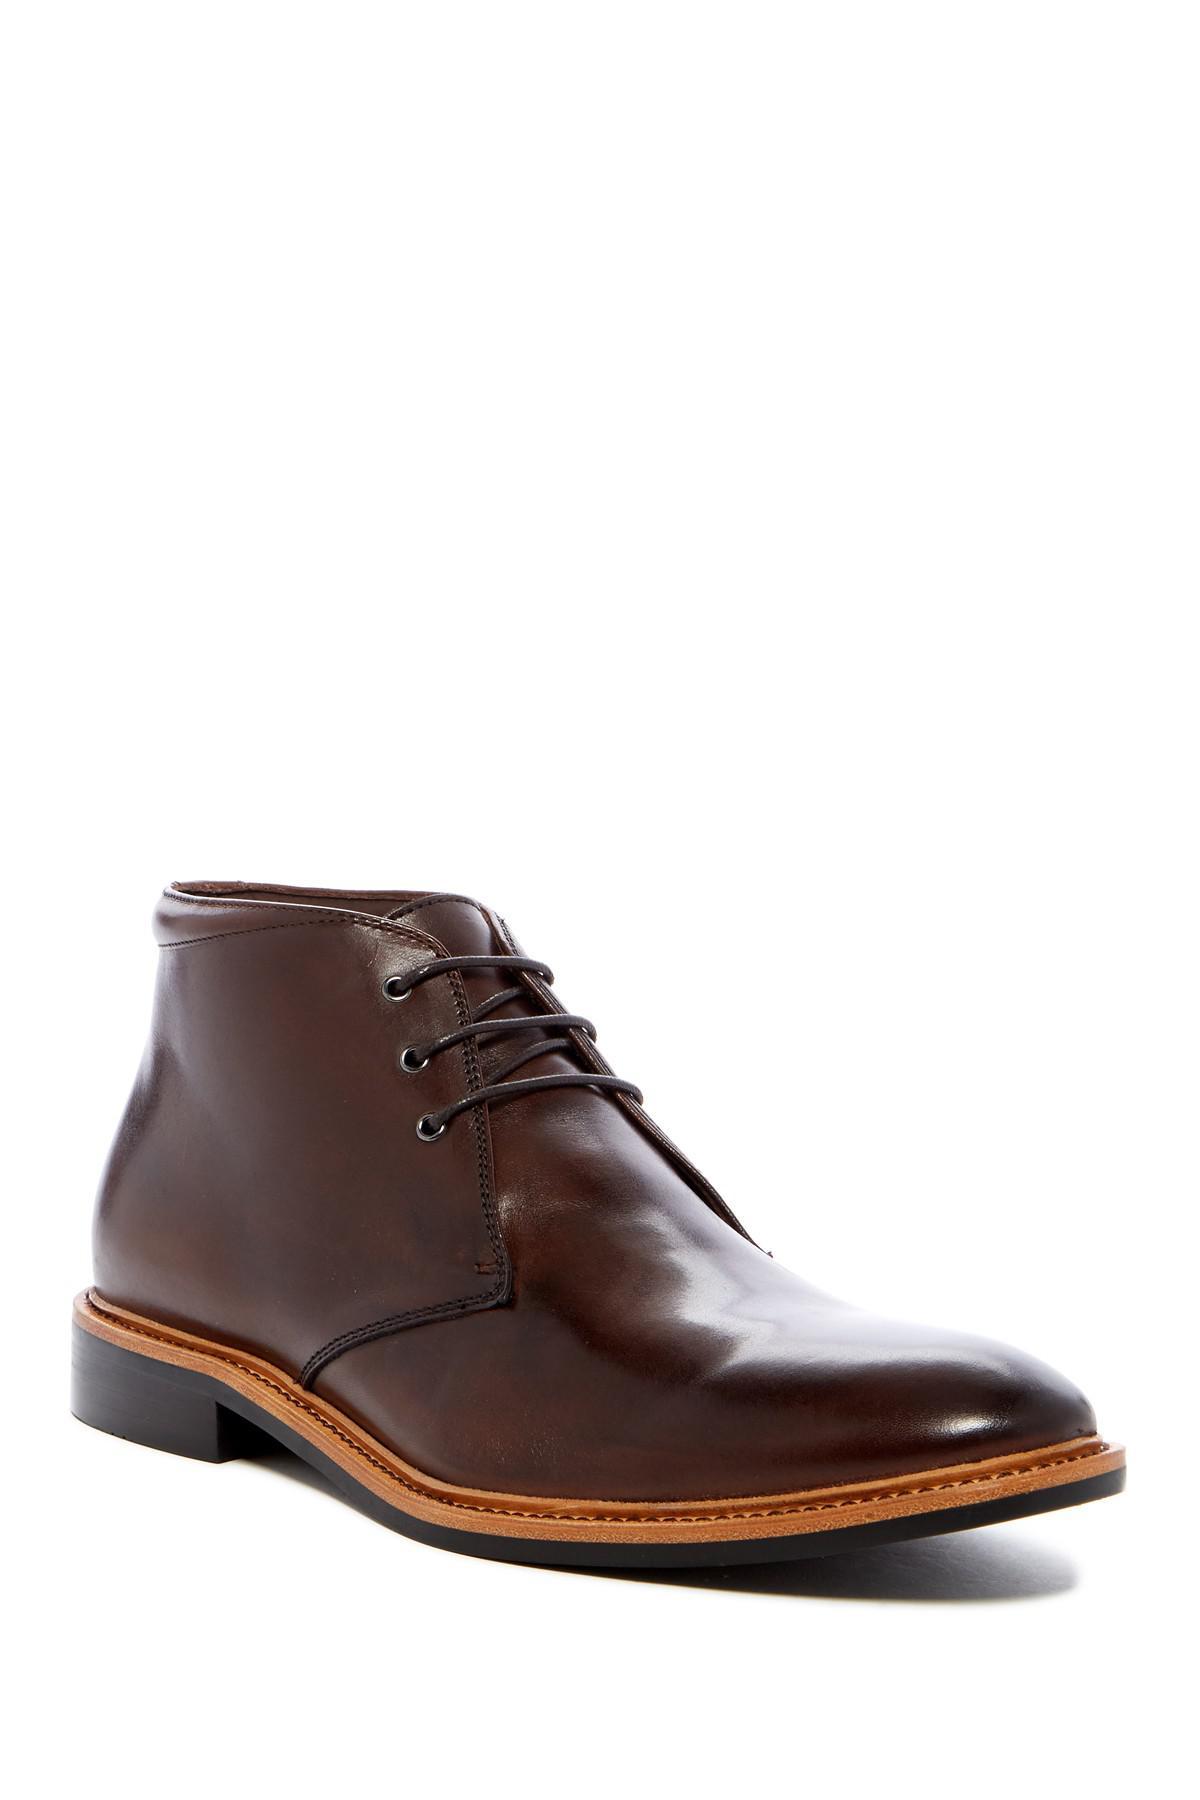 Lyst Gordon Rush Nathanson Chukka Boot In Brown For Men